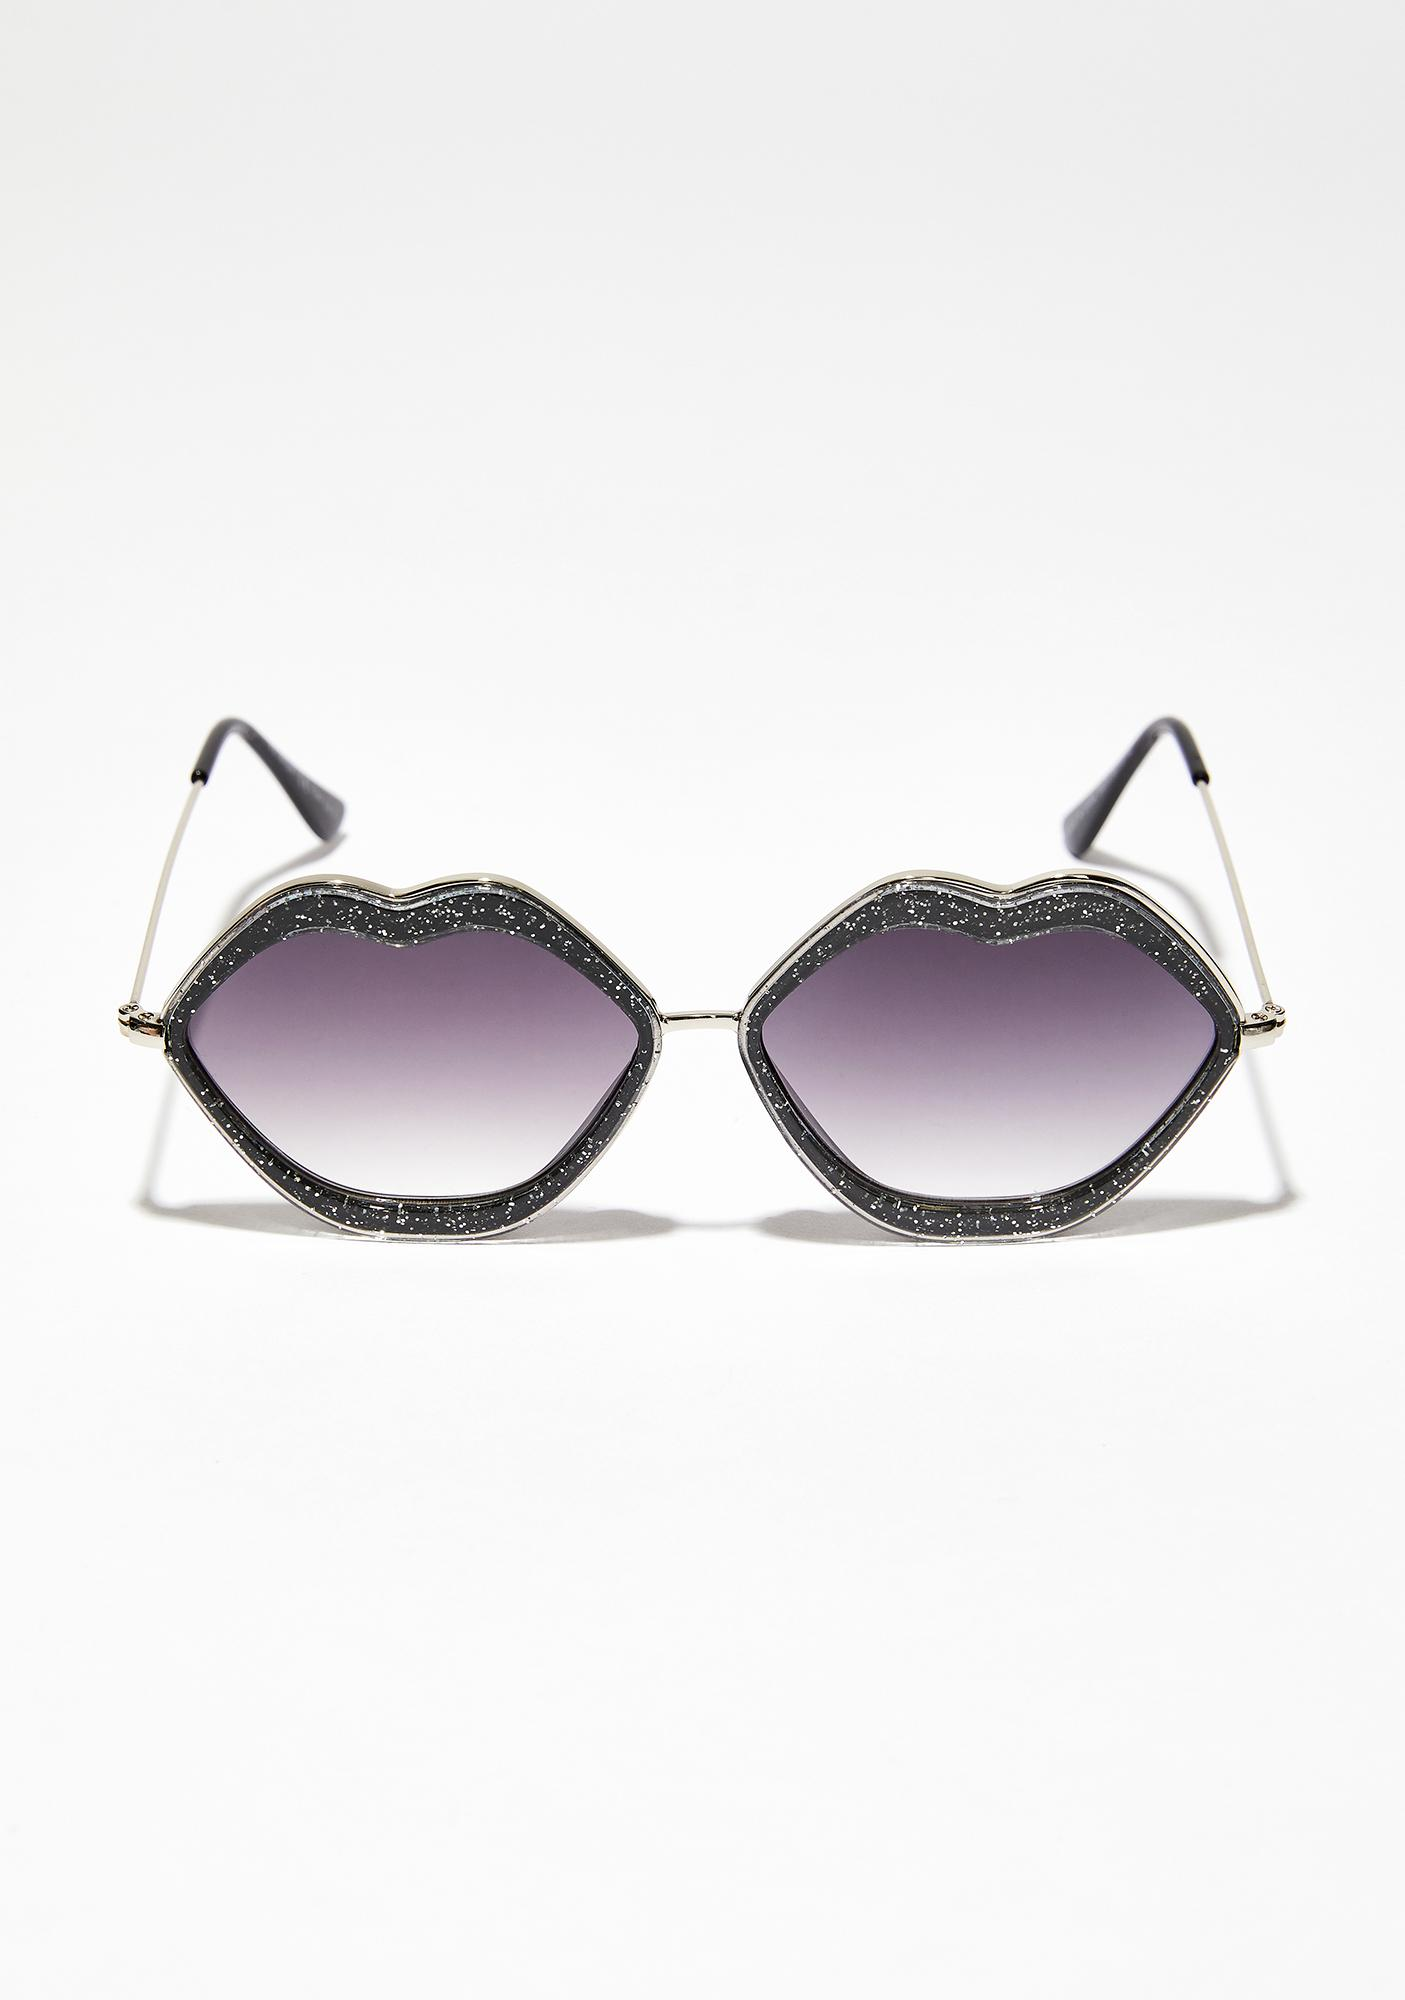 Lil Lip Action Sunglasses